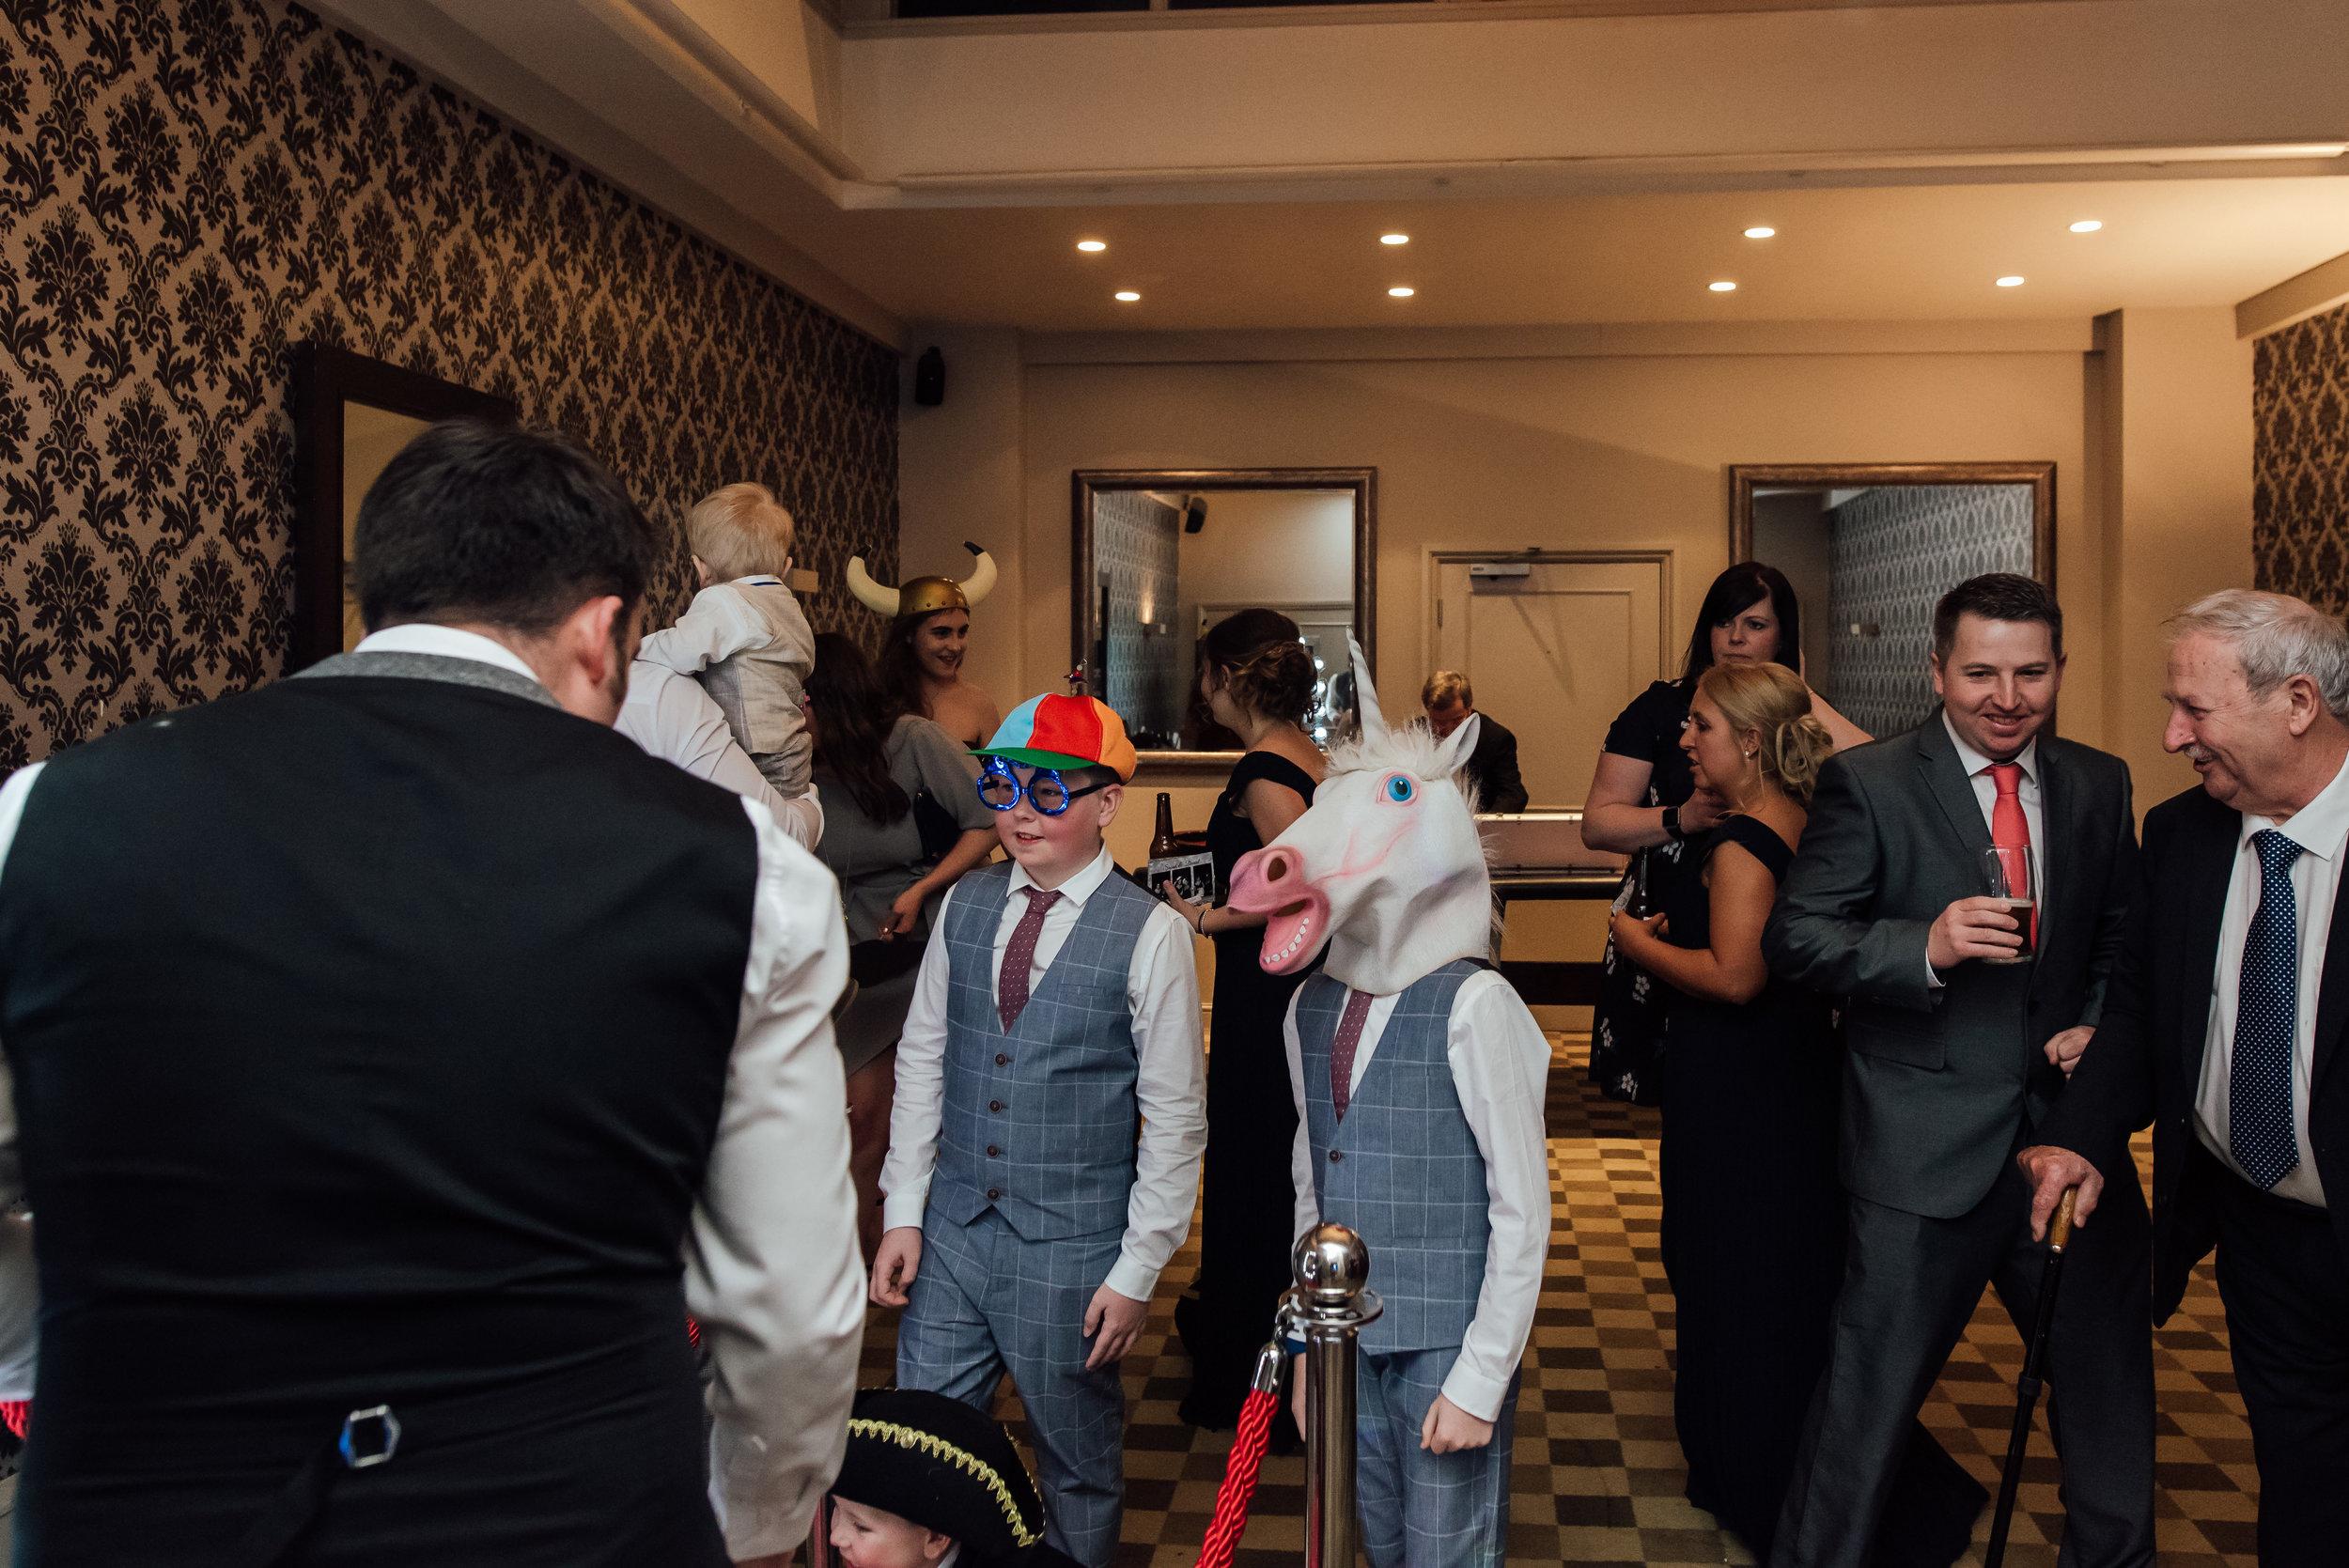 Sarah-Fishlock-Photography-Hampshire-wedding-photographer : fleet-wedding-photographer-fleet : warbrook-house-wedding-venue : warbrook-house-wedding-photographer :